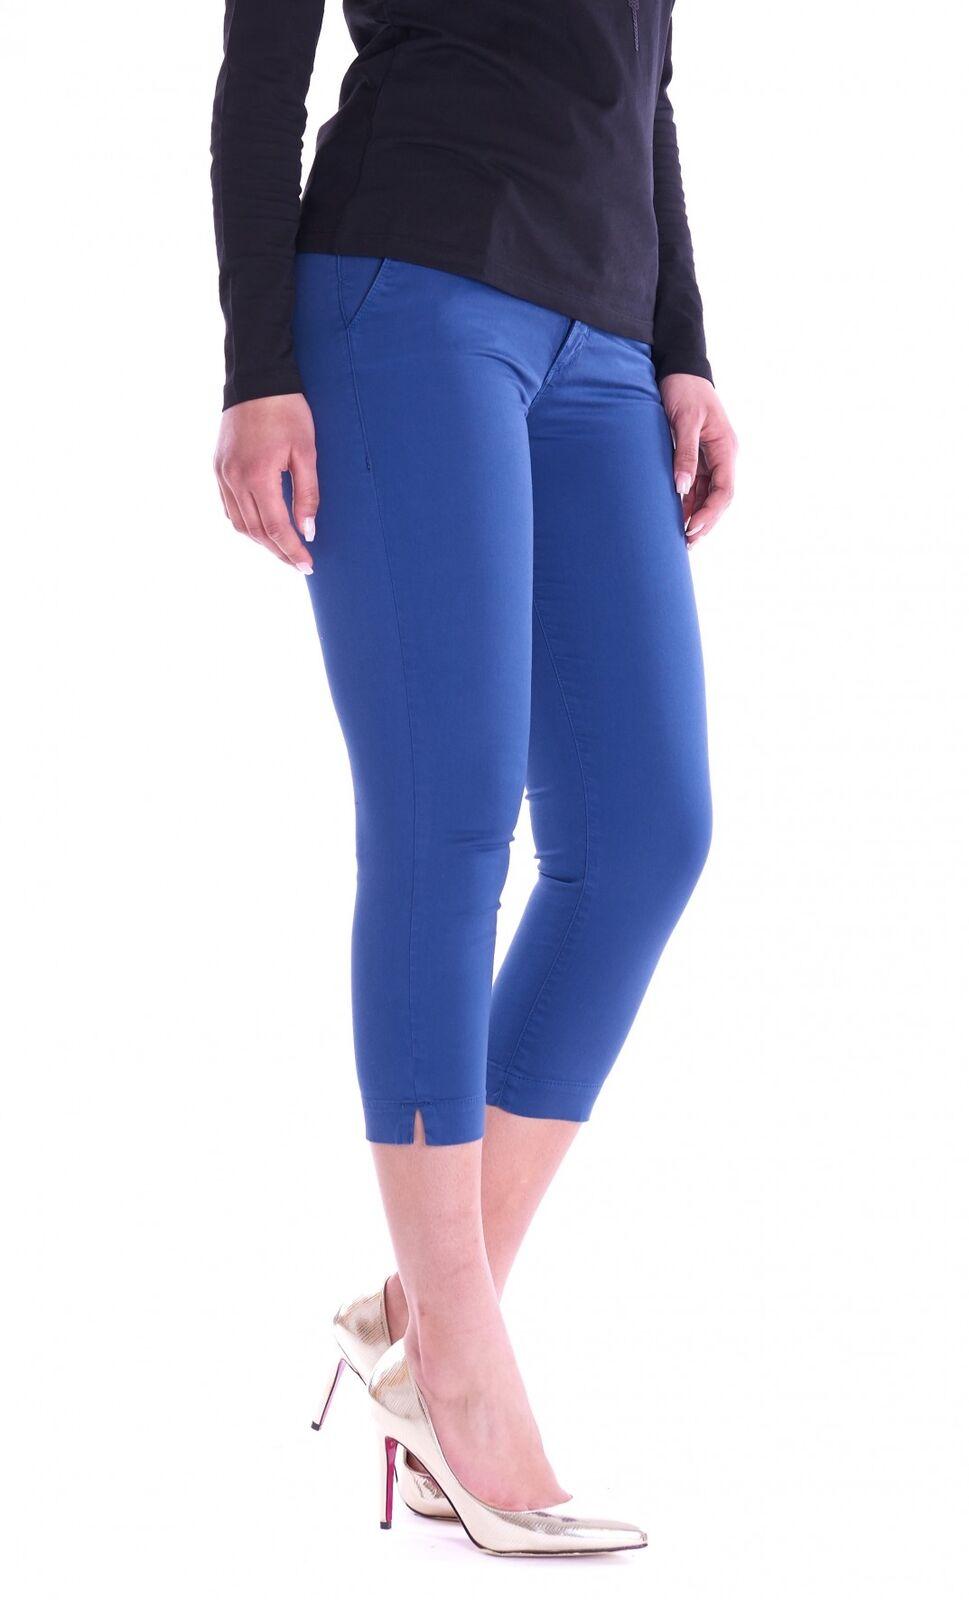 PANTALONE TRUSSARDI JEANS 260 CAPRI blue Trussardi Jeans 56P00008-1Y092015-U604-P